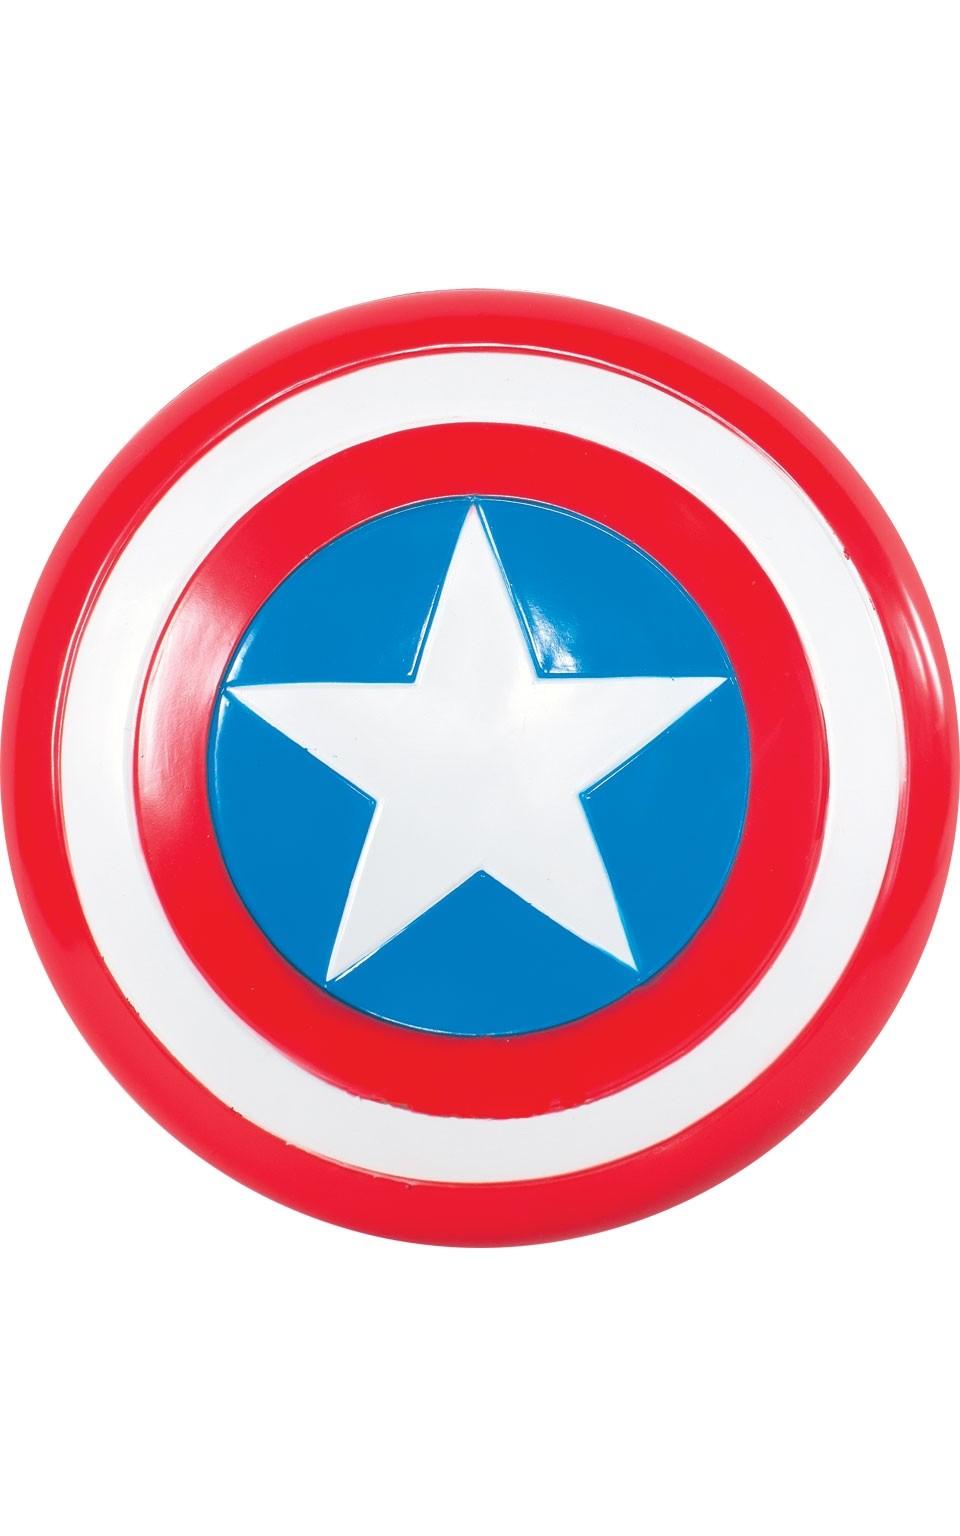 Щит Капитана Америка - Супергерои и комиксы